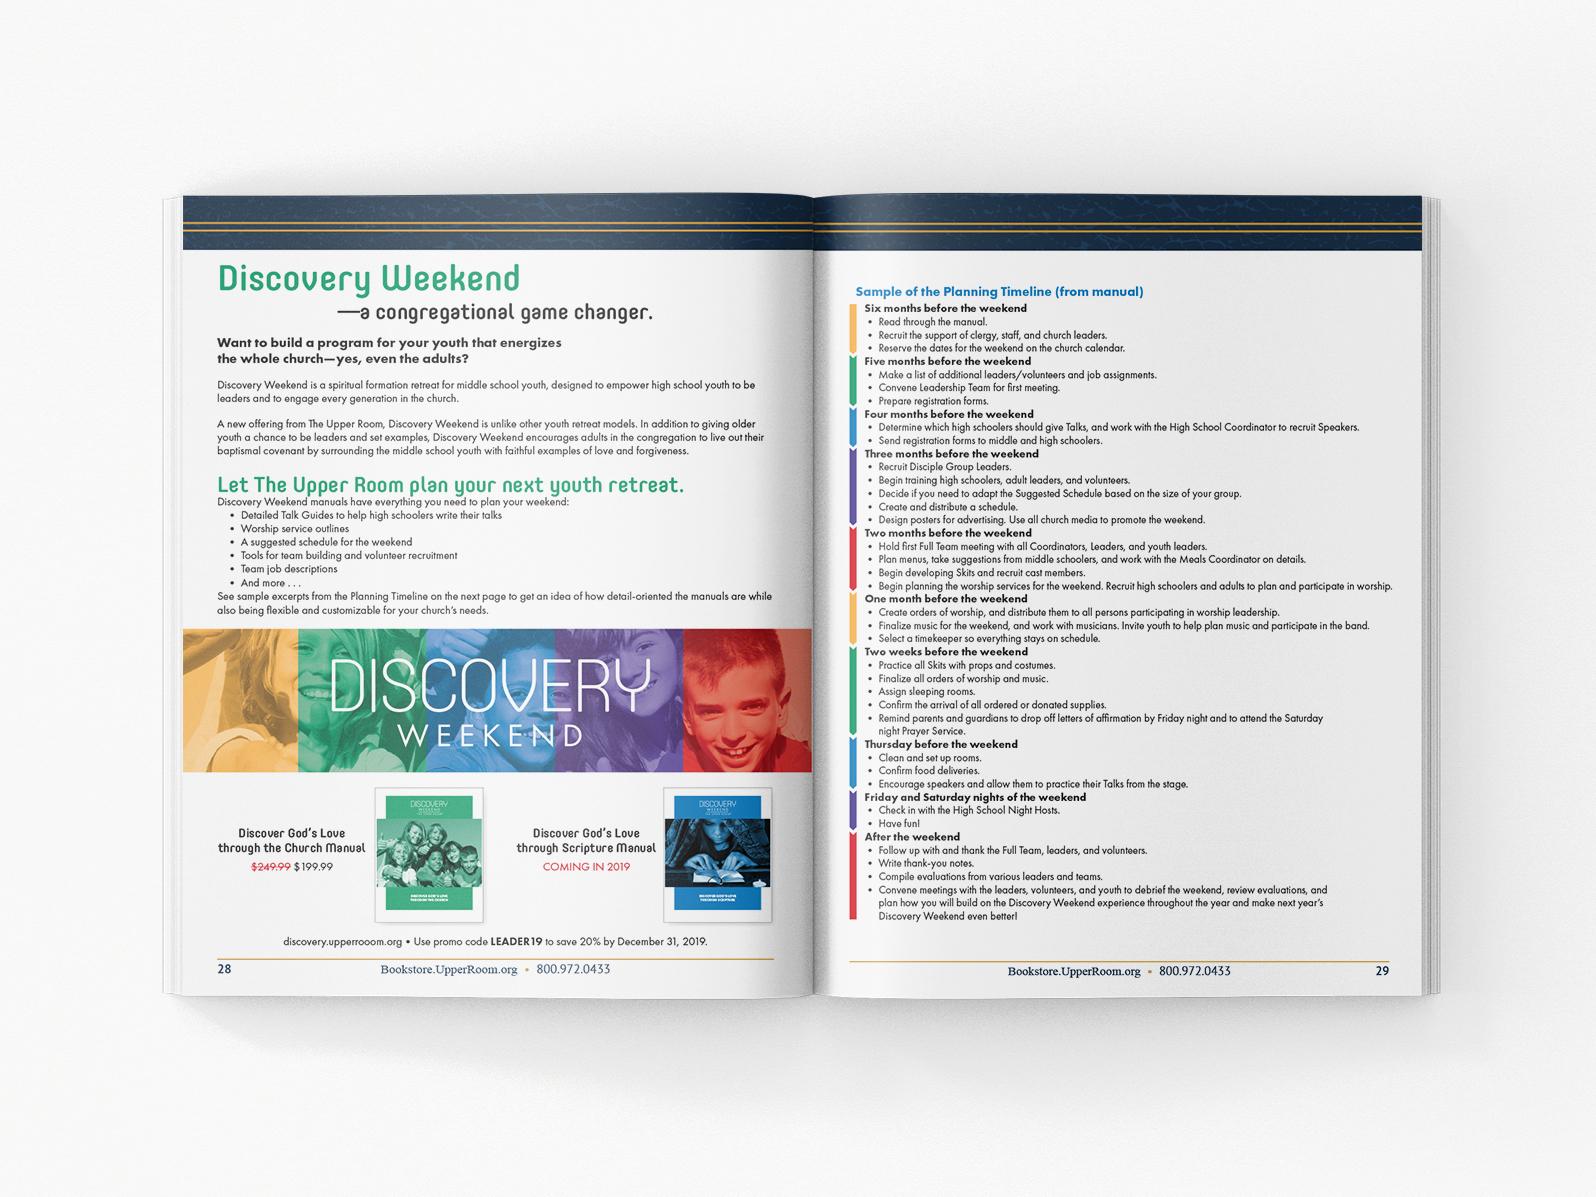 Discovery Ad brand design concept design advertisement page layout magazine ad magazine layout branding program design